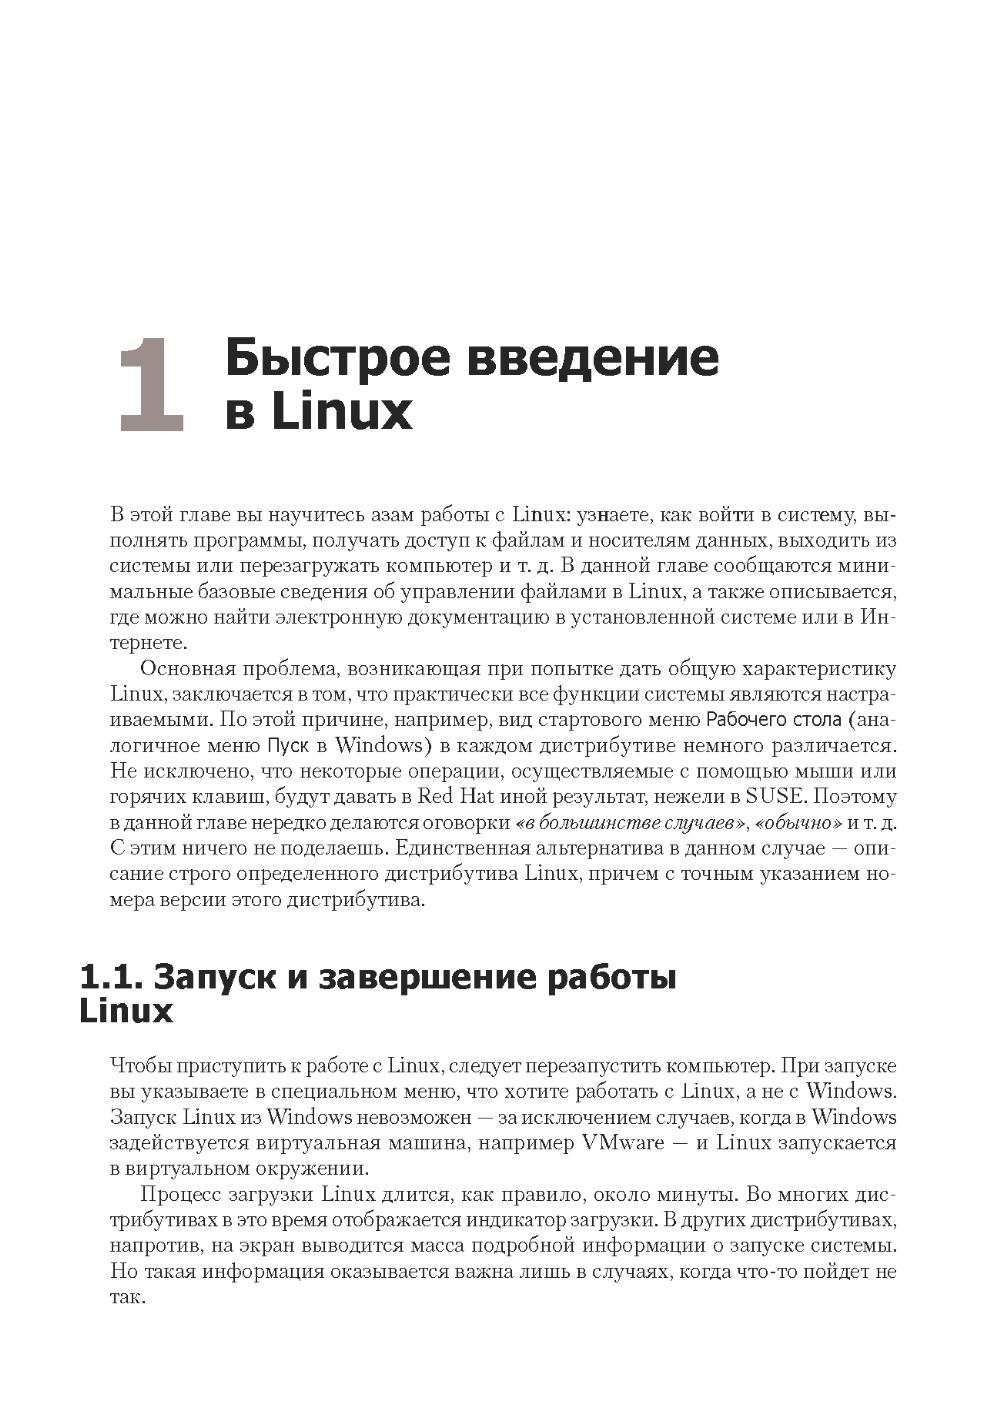 http://i6.imageban.ru/out/2013/12/11/789c3fba99612e22dd08c475d68945e6.jpg